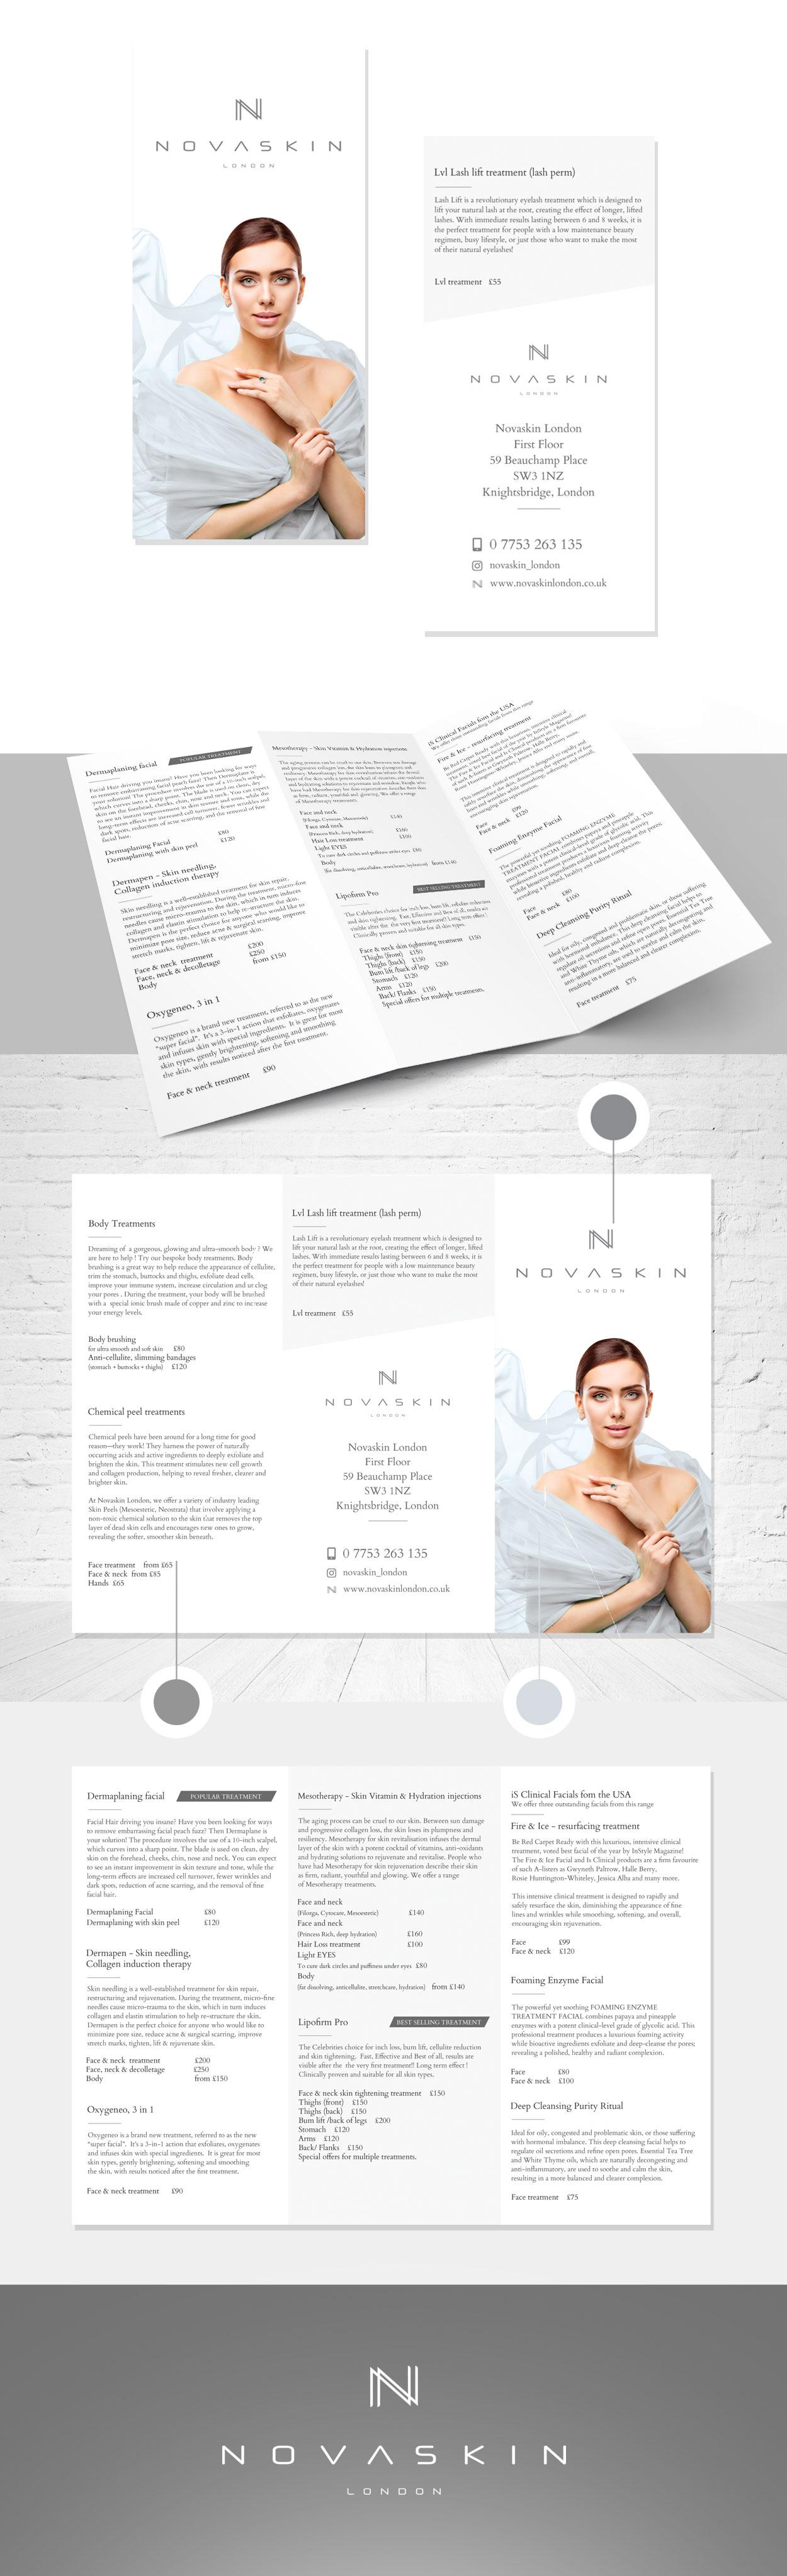 projekt-ulotki-skladanej-salon-kosmetyczny-nova-skin